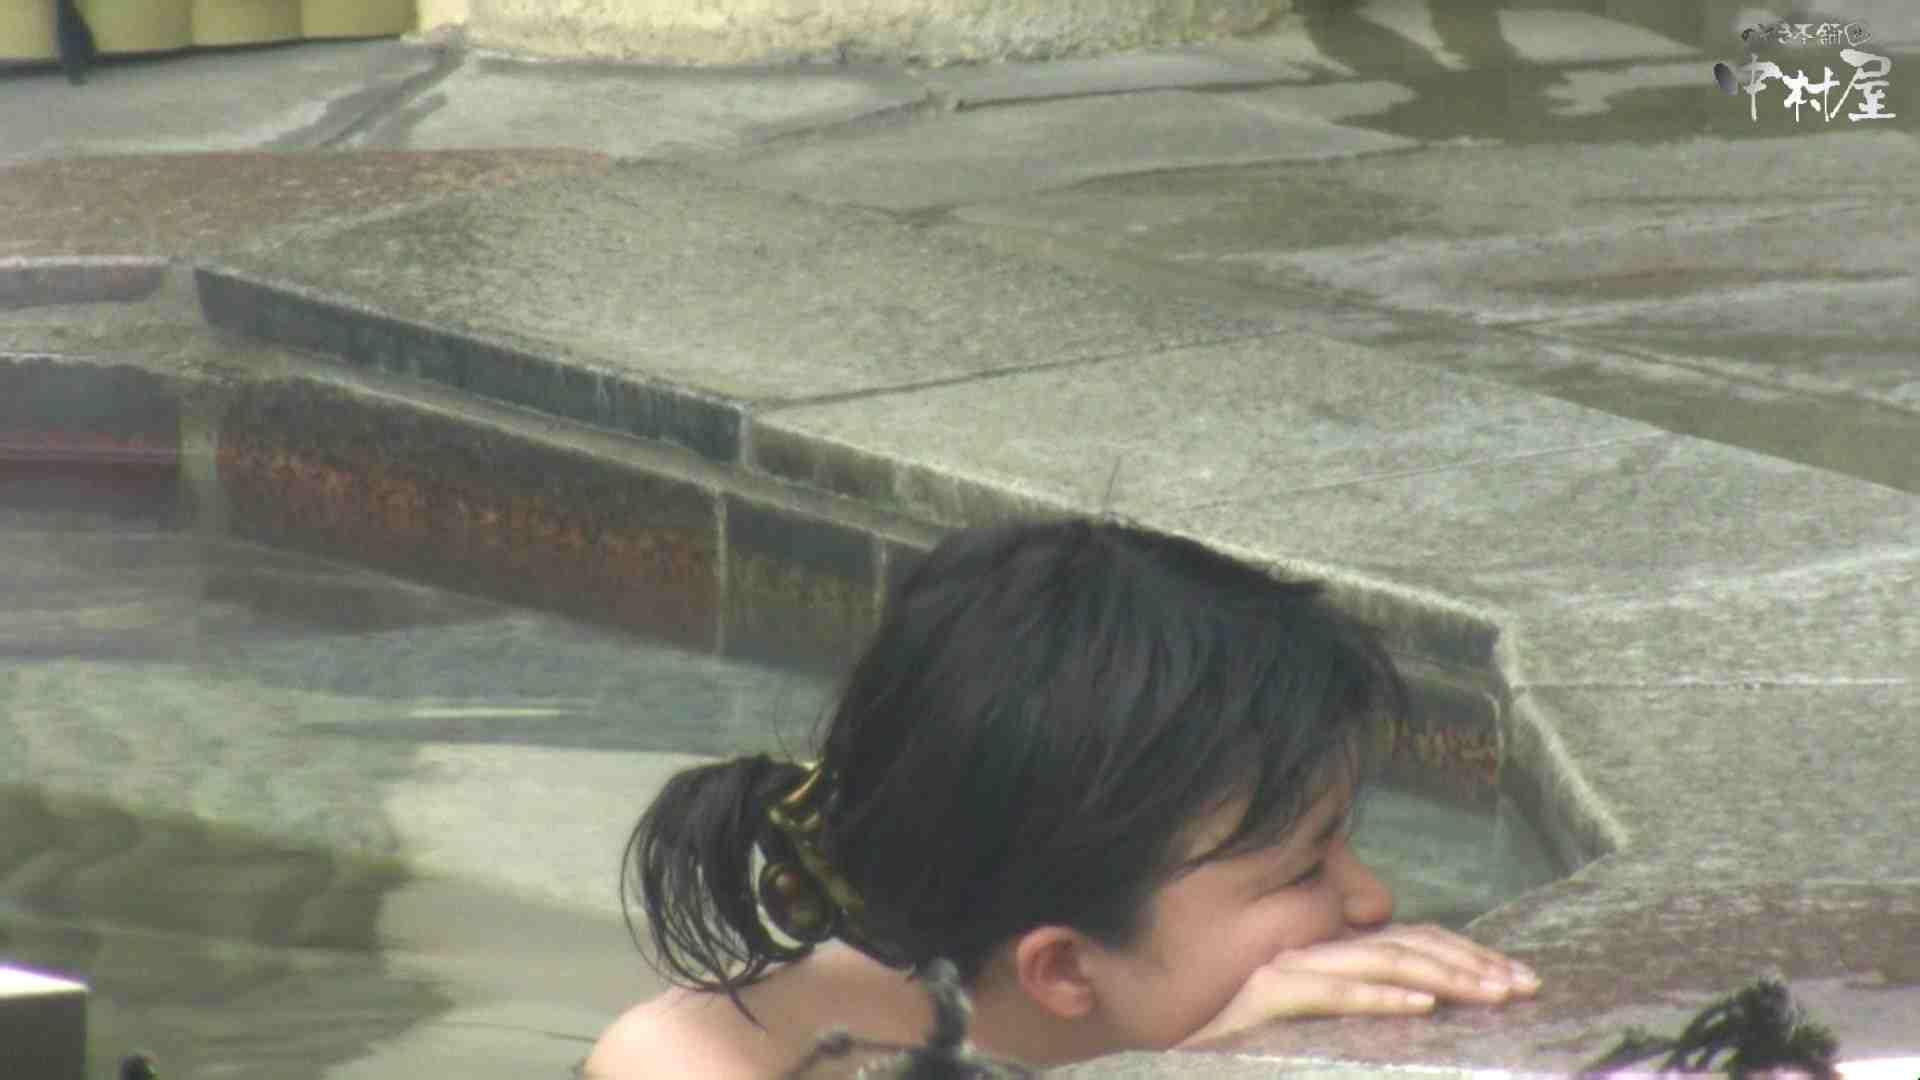 Aquaな露天風呂Vol.894 盗撮シリーズ | 露天風呂編  85PIX 43